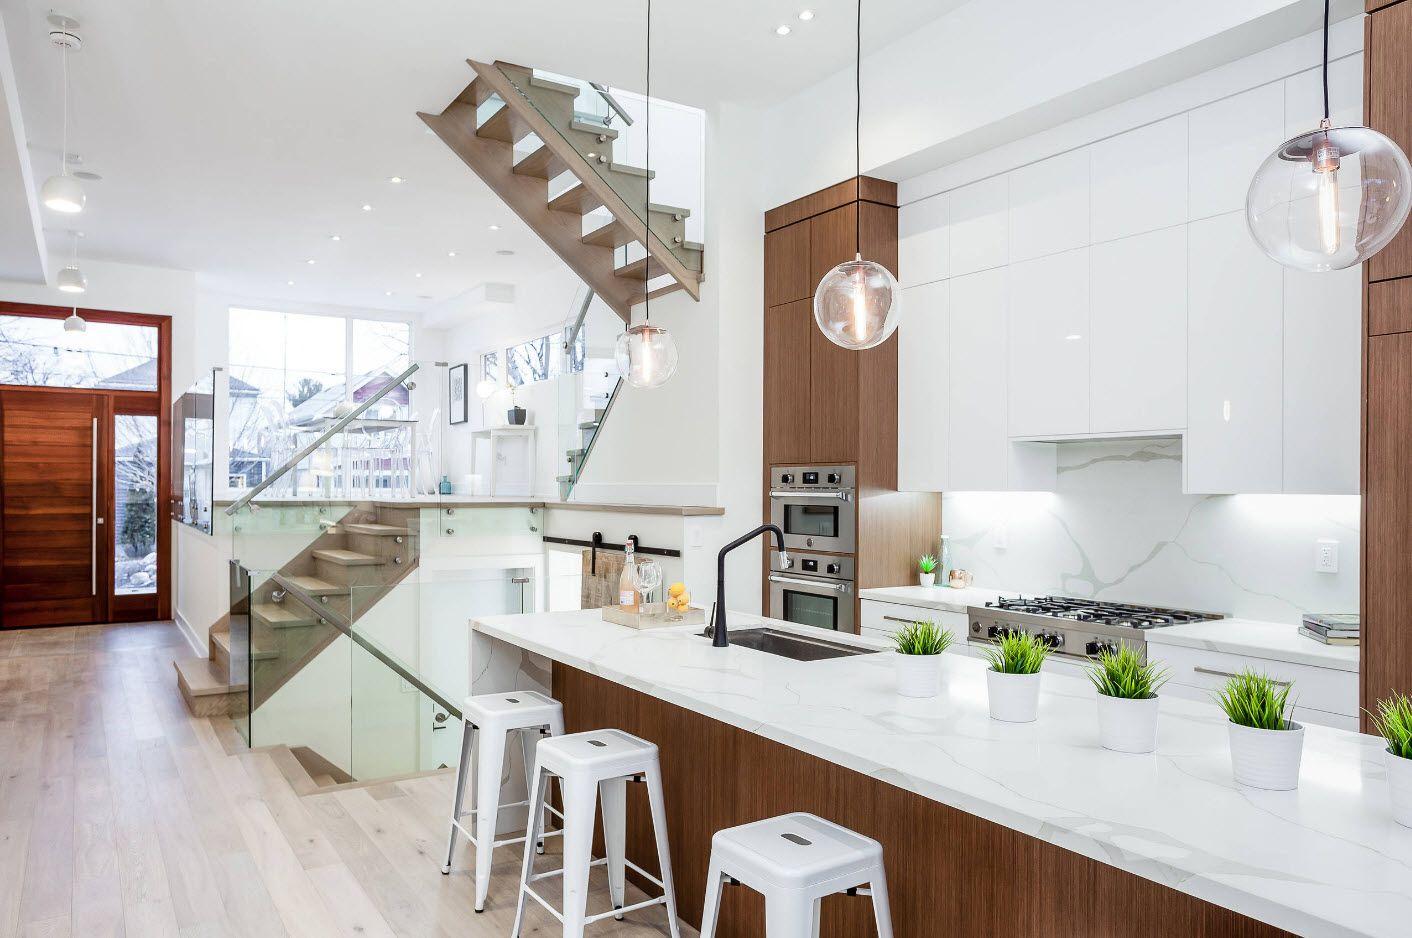 Unusual metallic stairs and hi-tech snow-white design